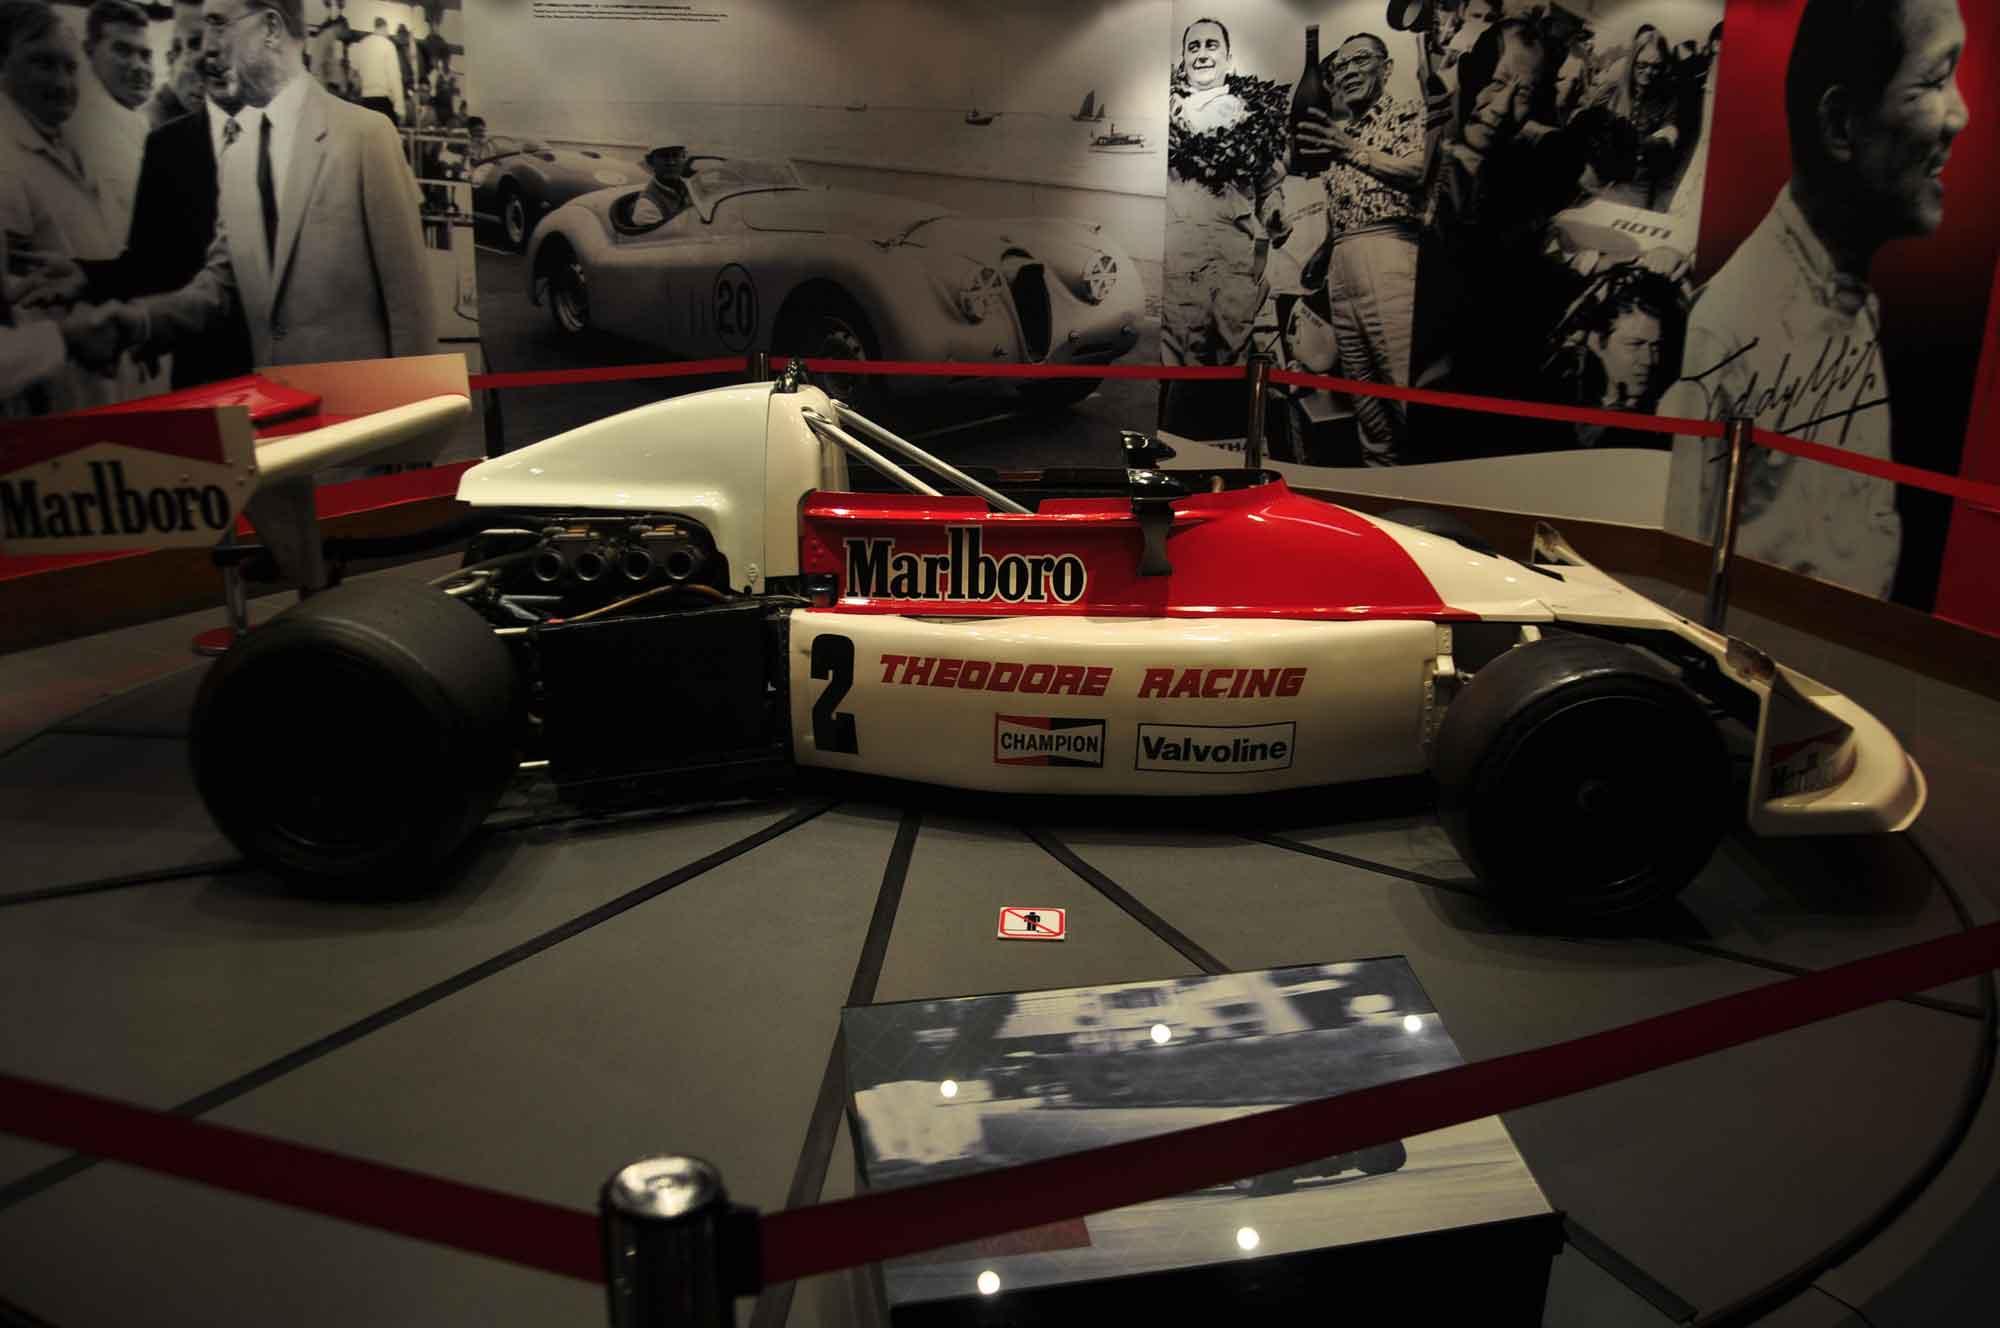 Grand Prix Museum race car